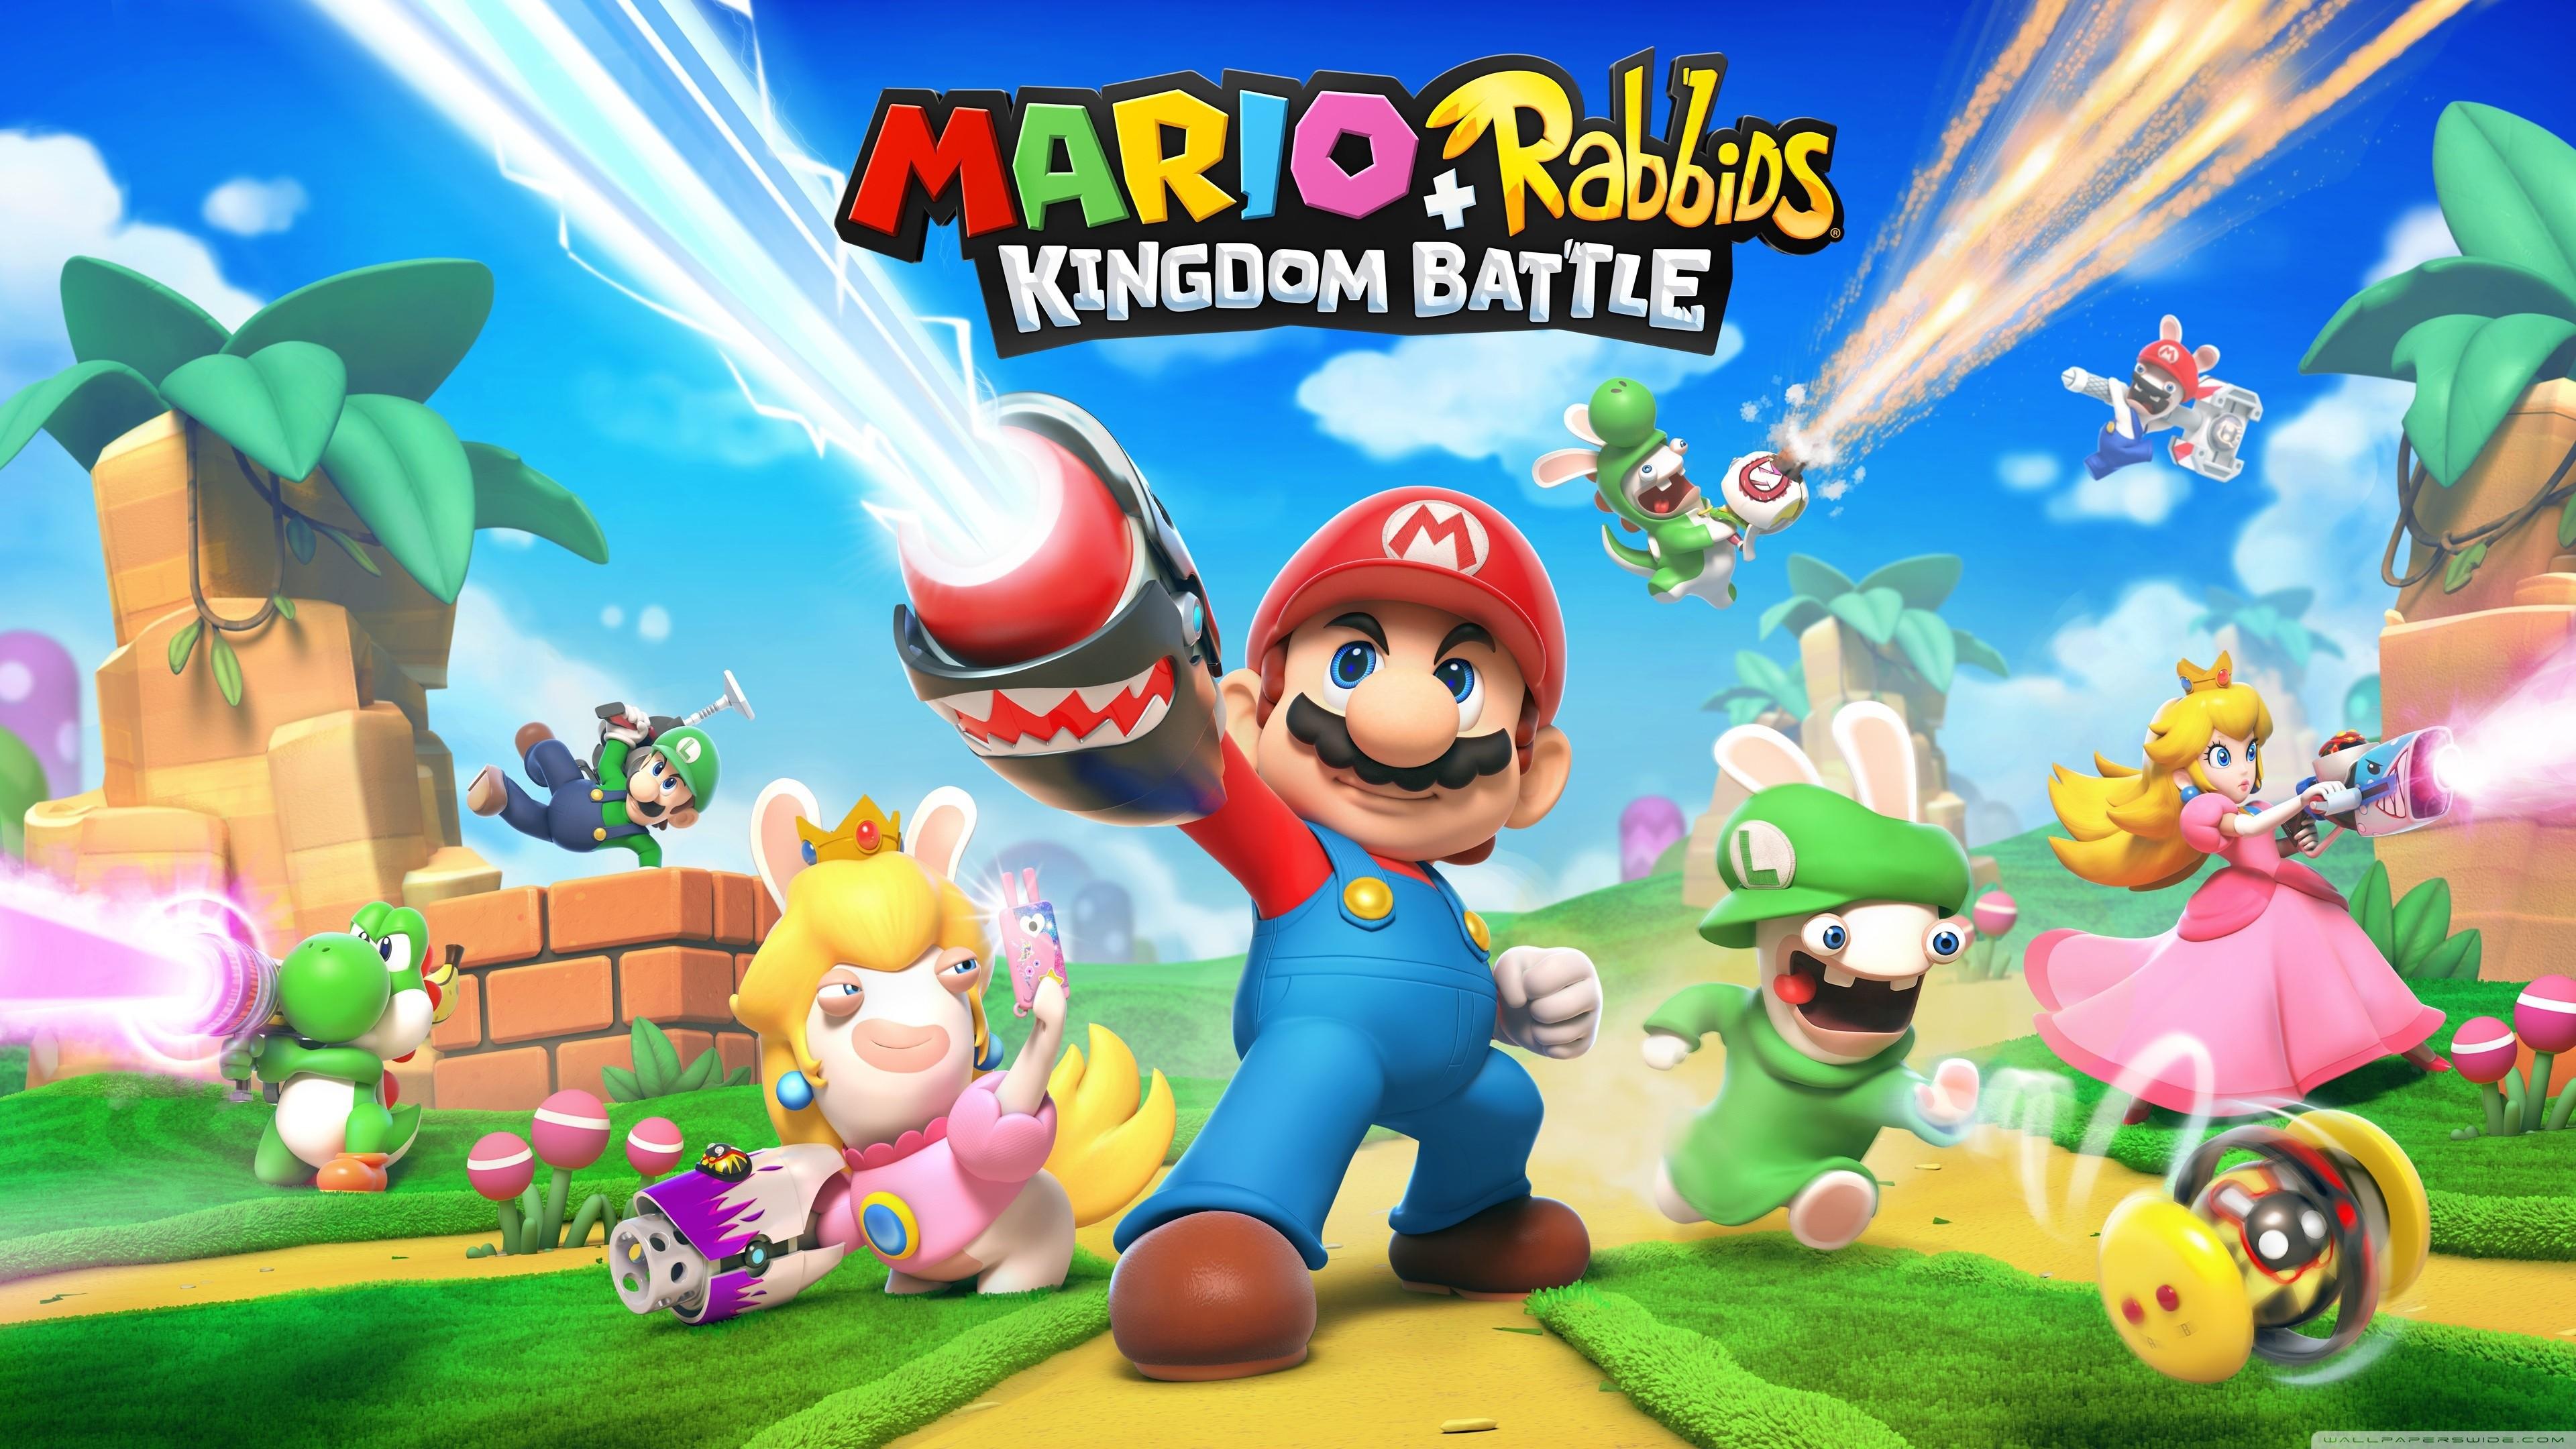 Mario Rabbids Kingdom Battle 2017 game HD Wide Wallpaper for Widescreen